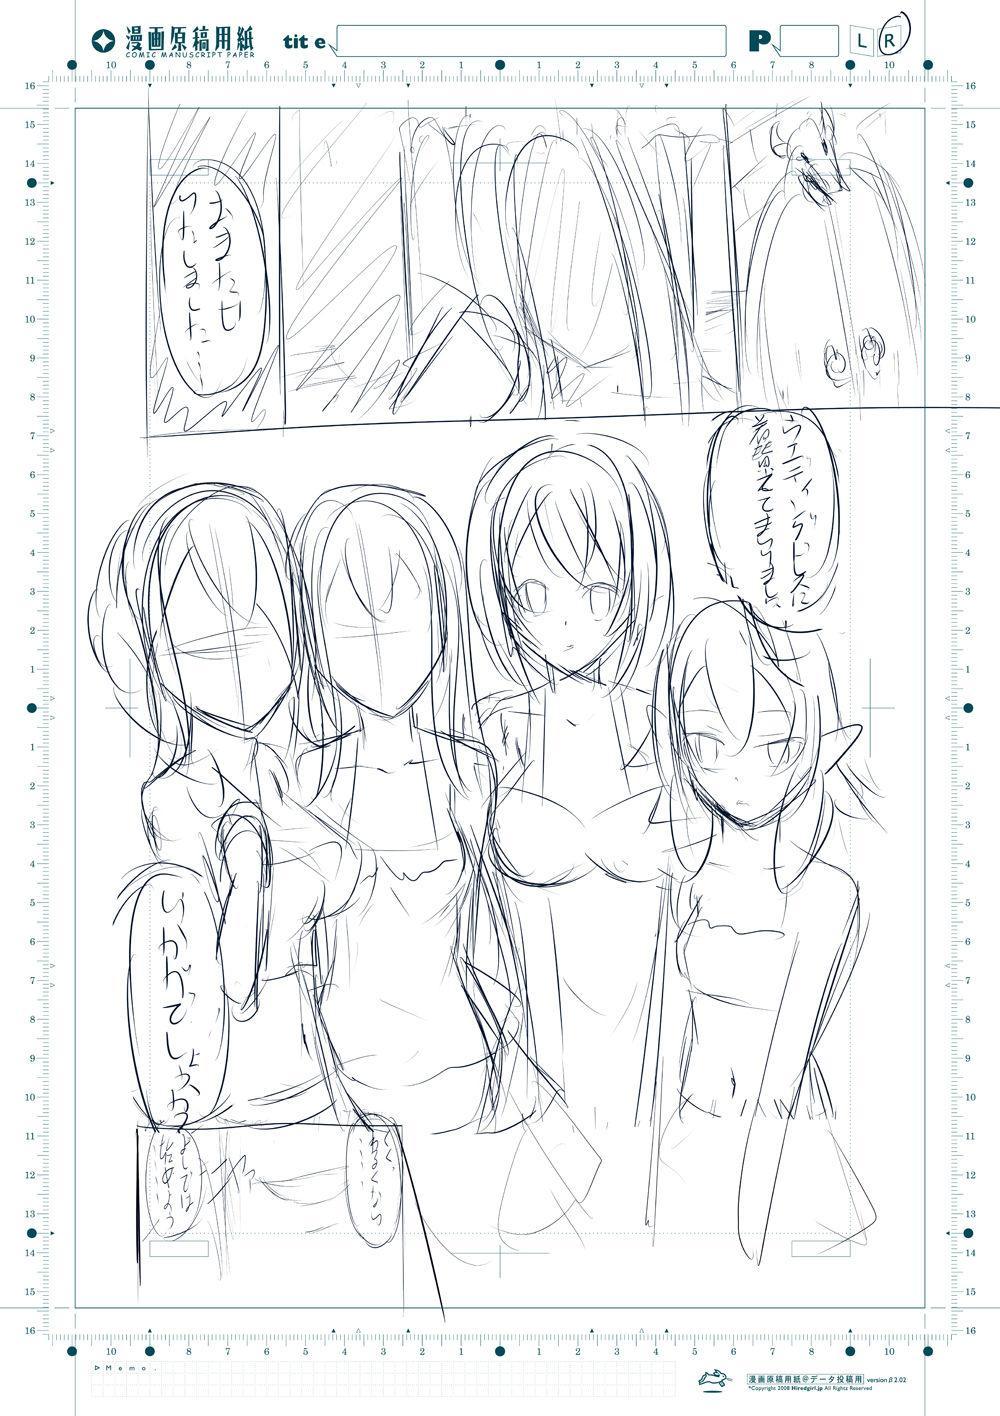 Goblin Slayer Sennou Manga 22